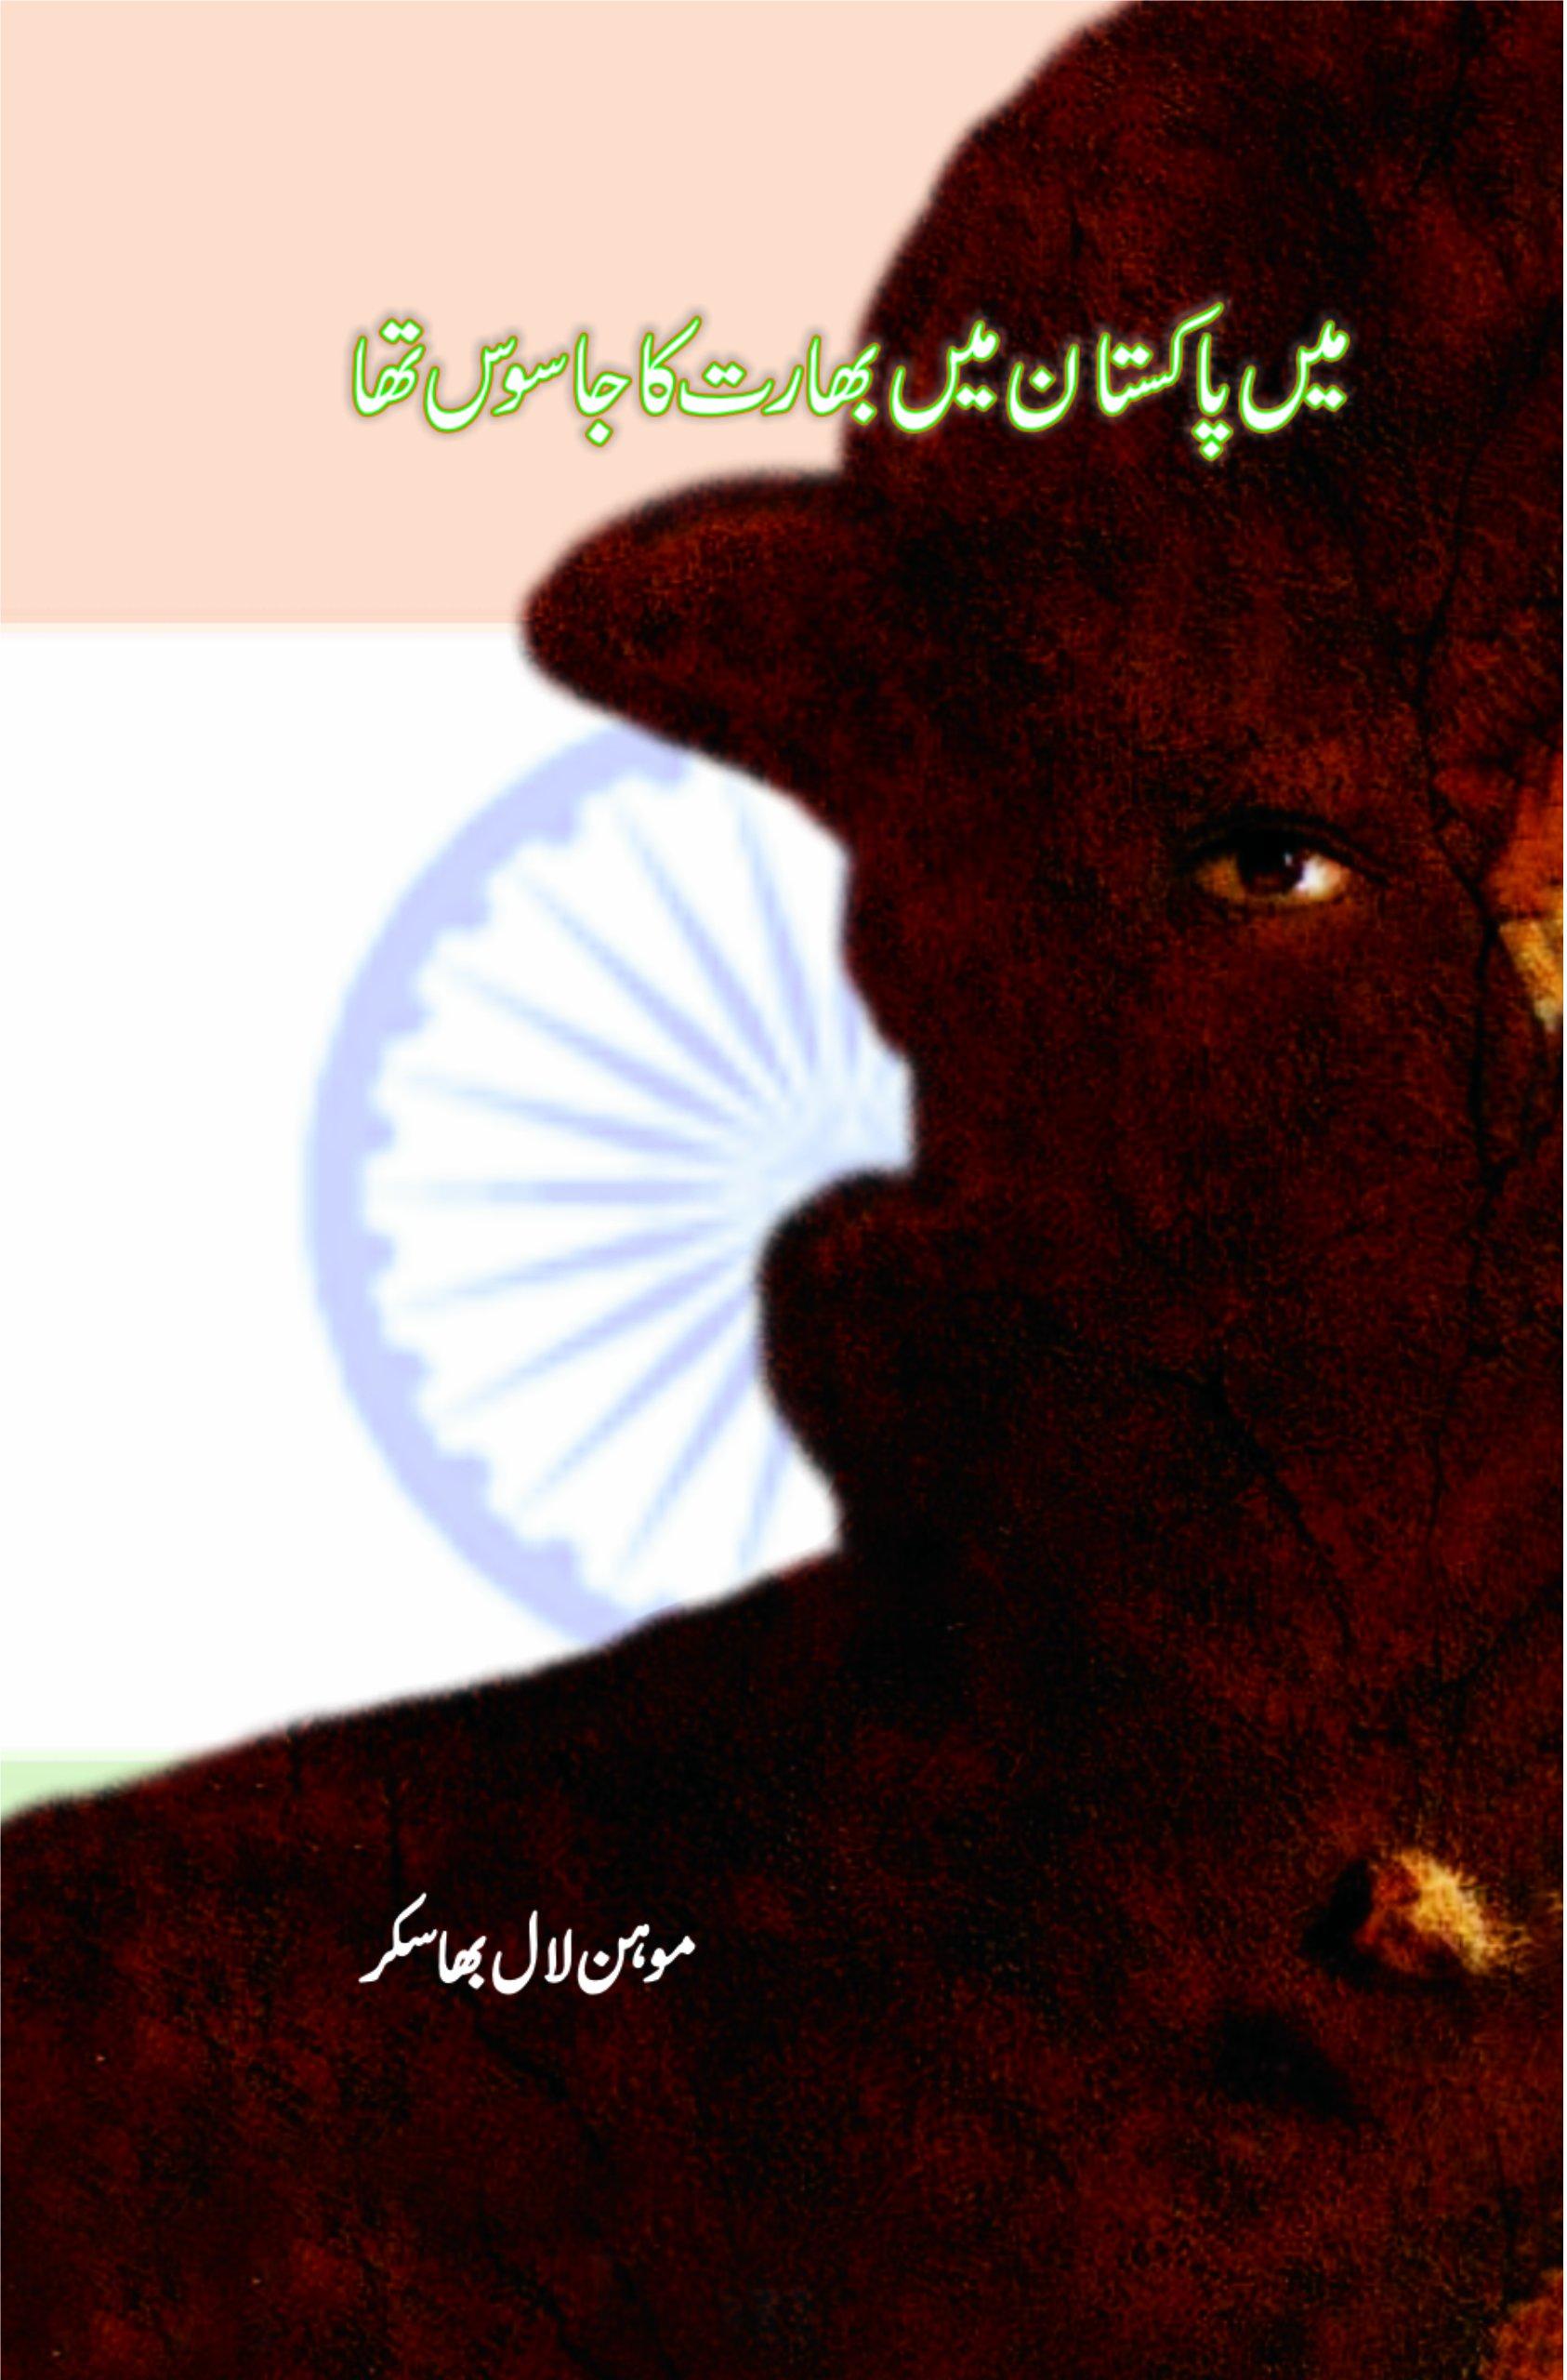 mohanlal bhaskar book pdf free download